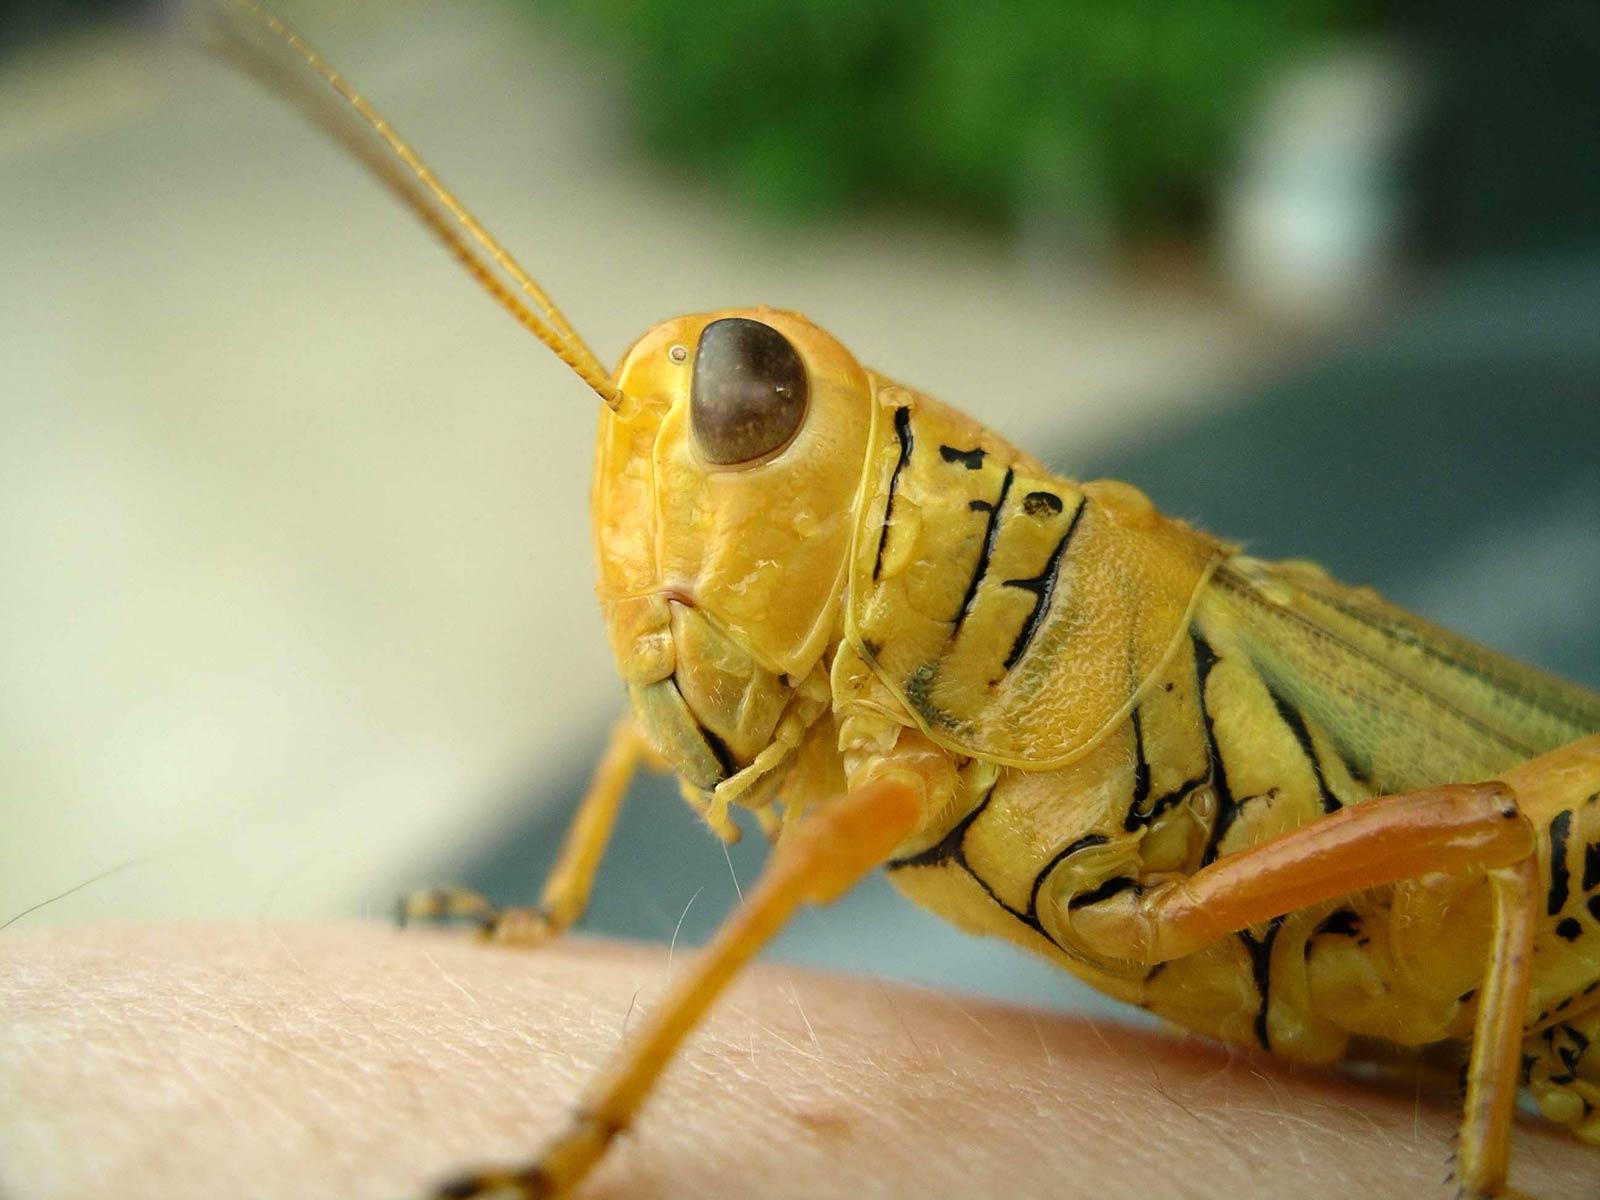 Free Grasshopper Wallpaper - Animals Town